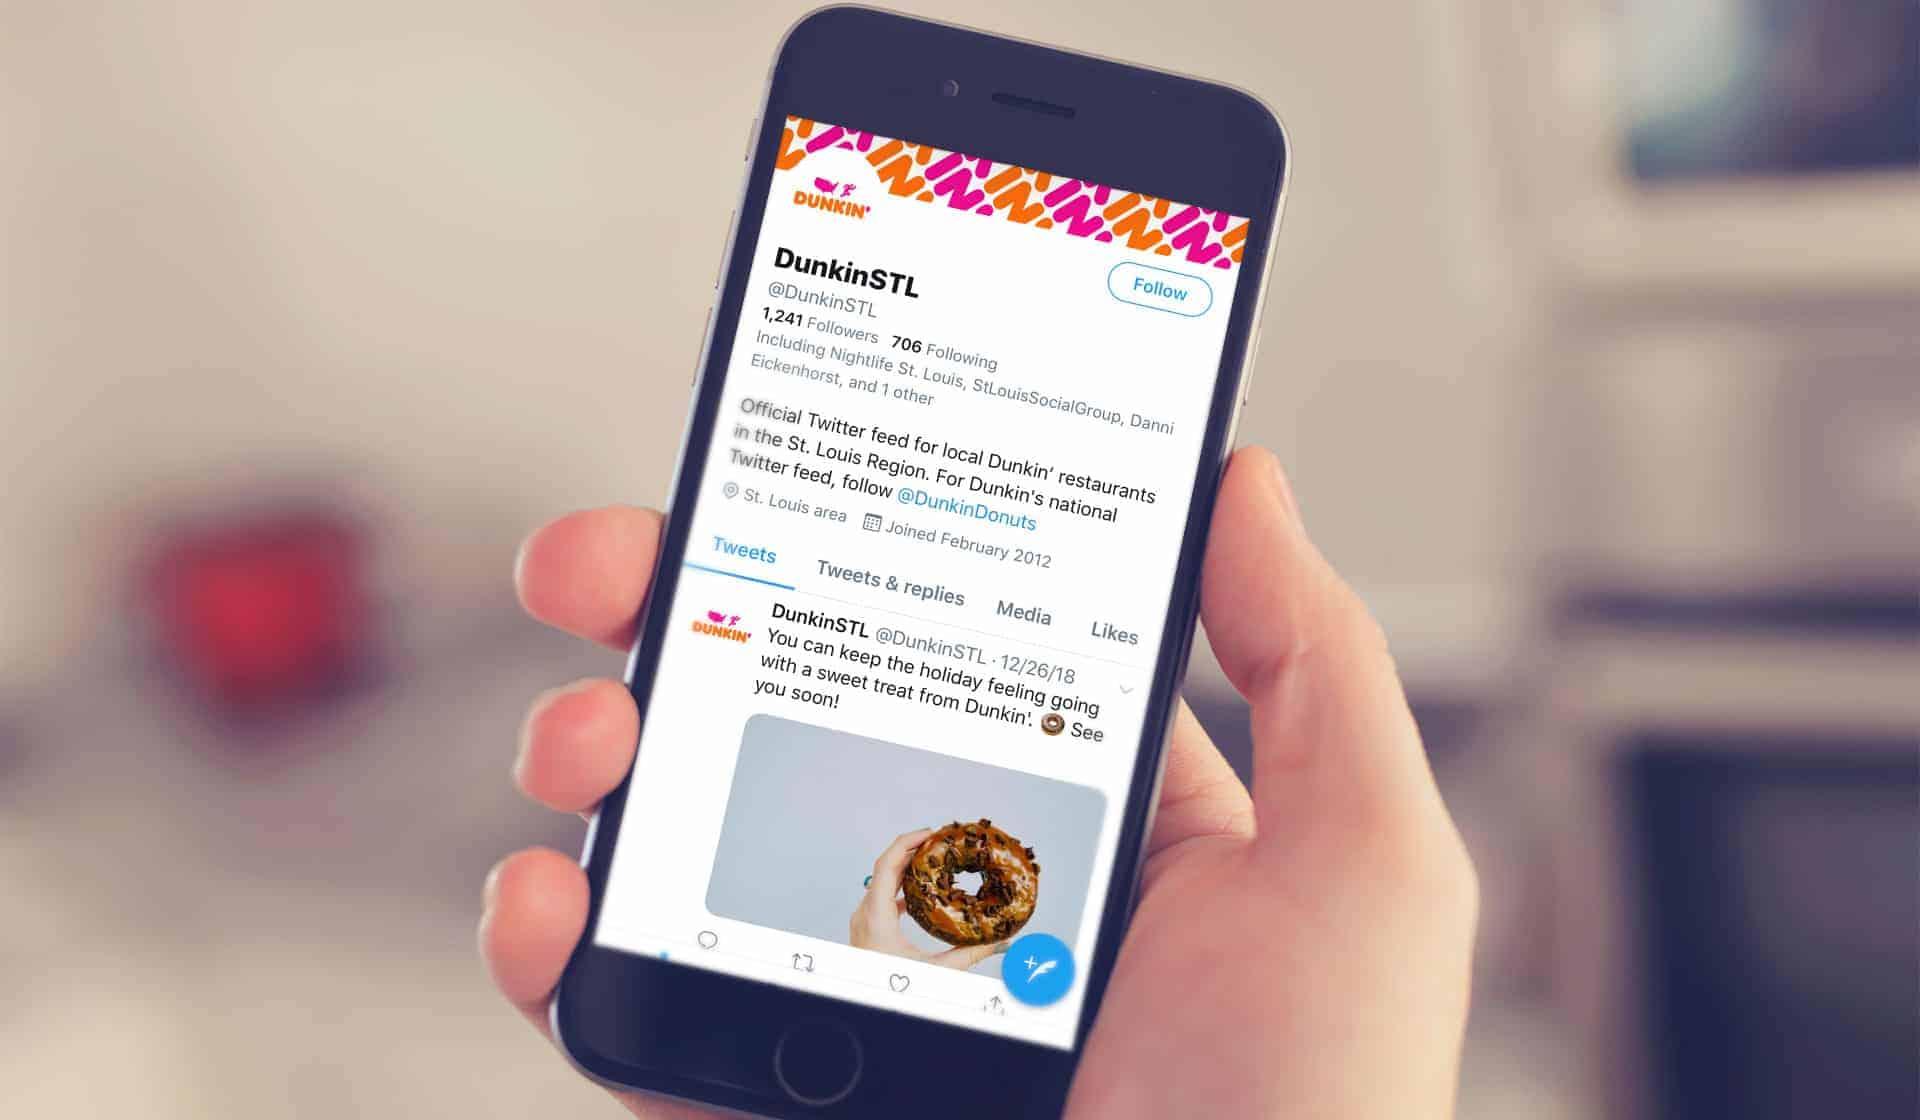 Dunkin' Donuts Twitter feed